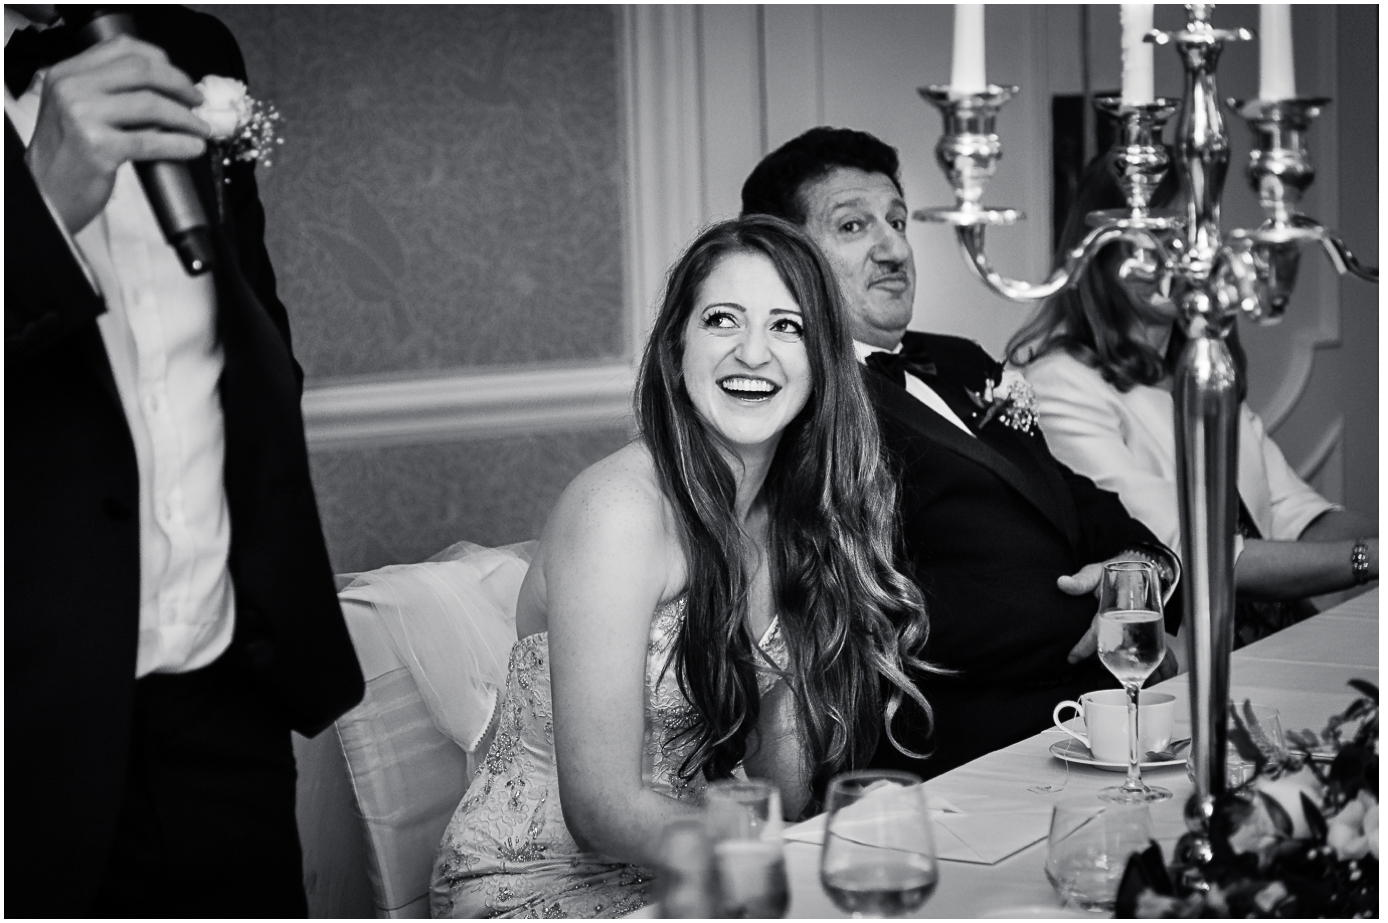 72 - Esmat and Angus - St. Ermin's Hotel London wedding photographer